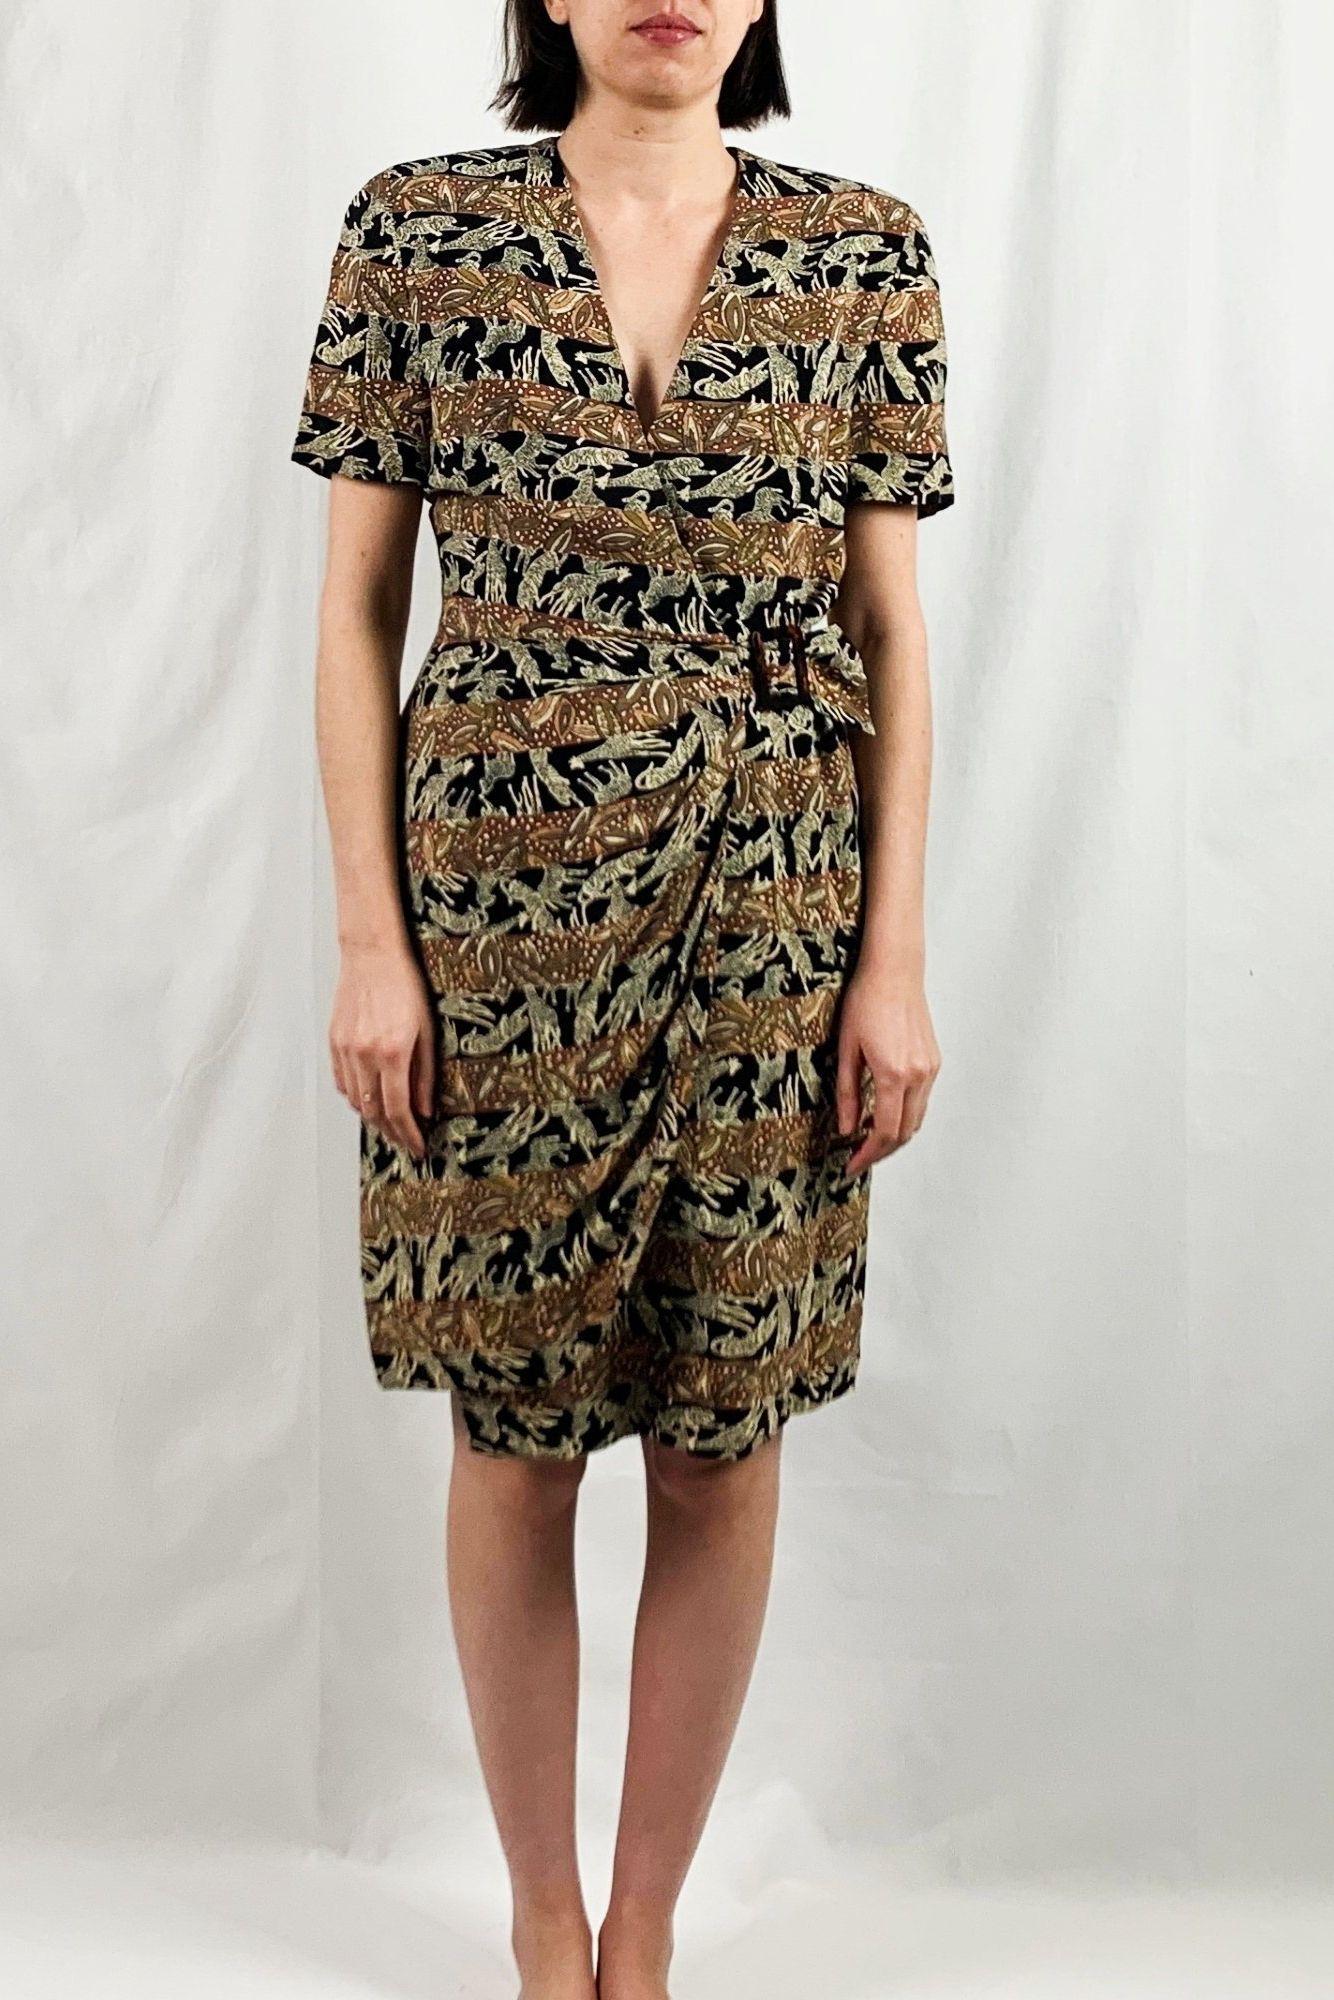 Jones New York Animal Print Wrap Dress Vintage 90s Etsy Printed Wrap Dresses Vintage Wrap Dress Vintage Dresses [ 2000 x 1334 Pixel ]